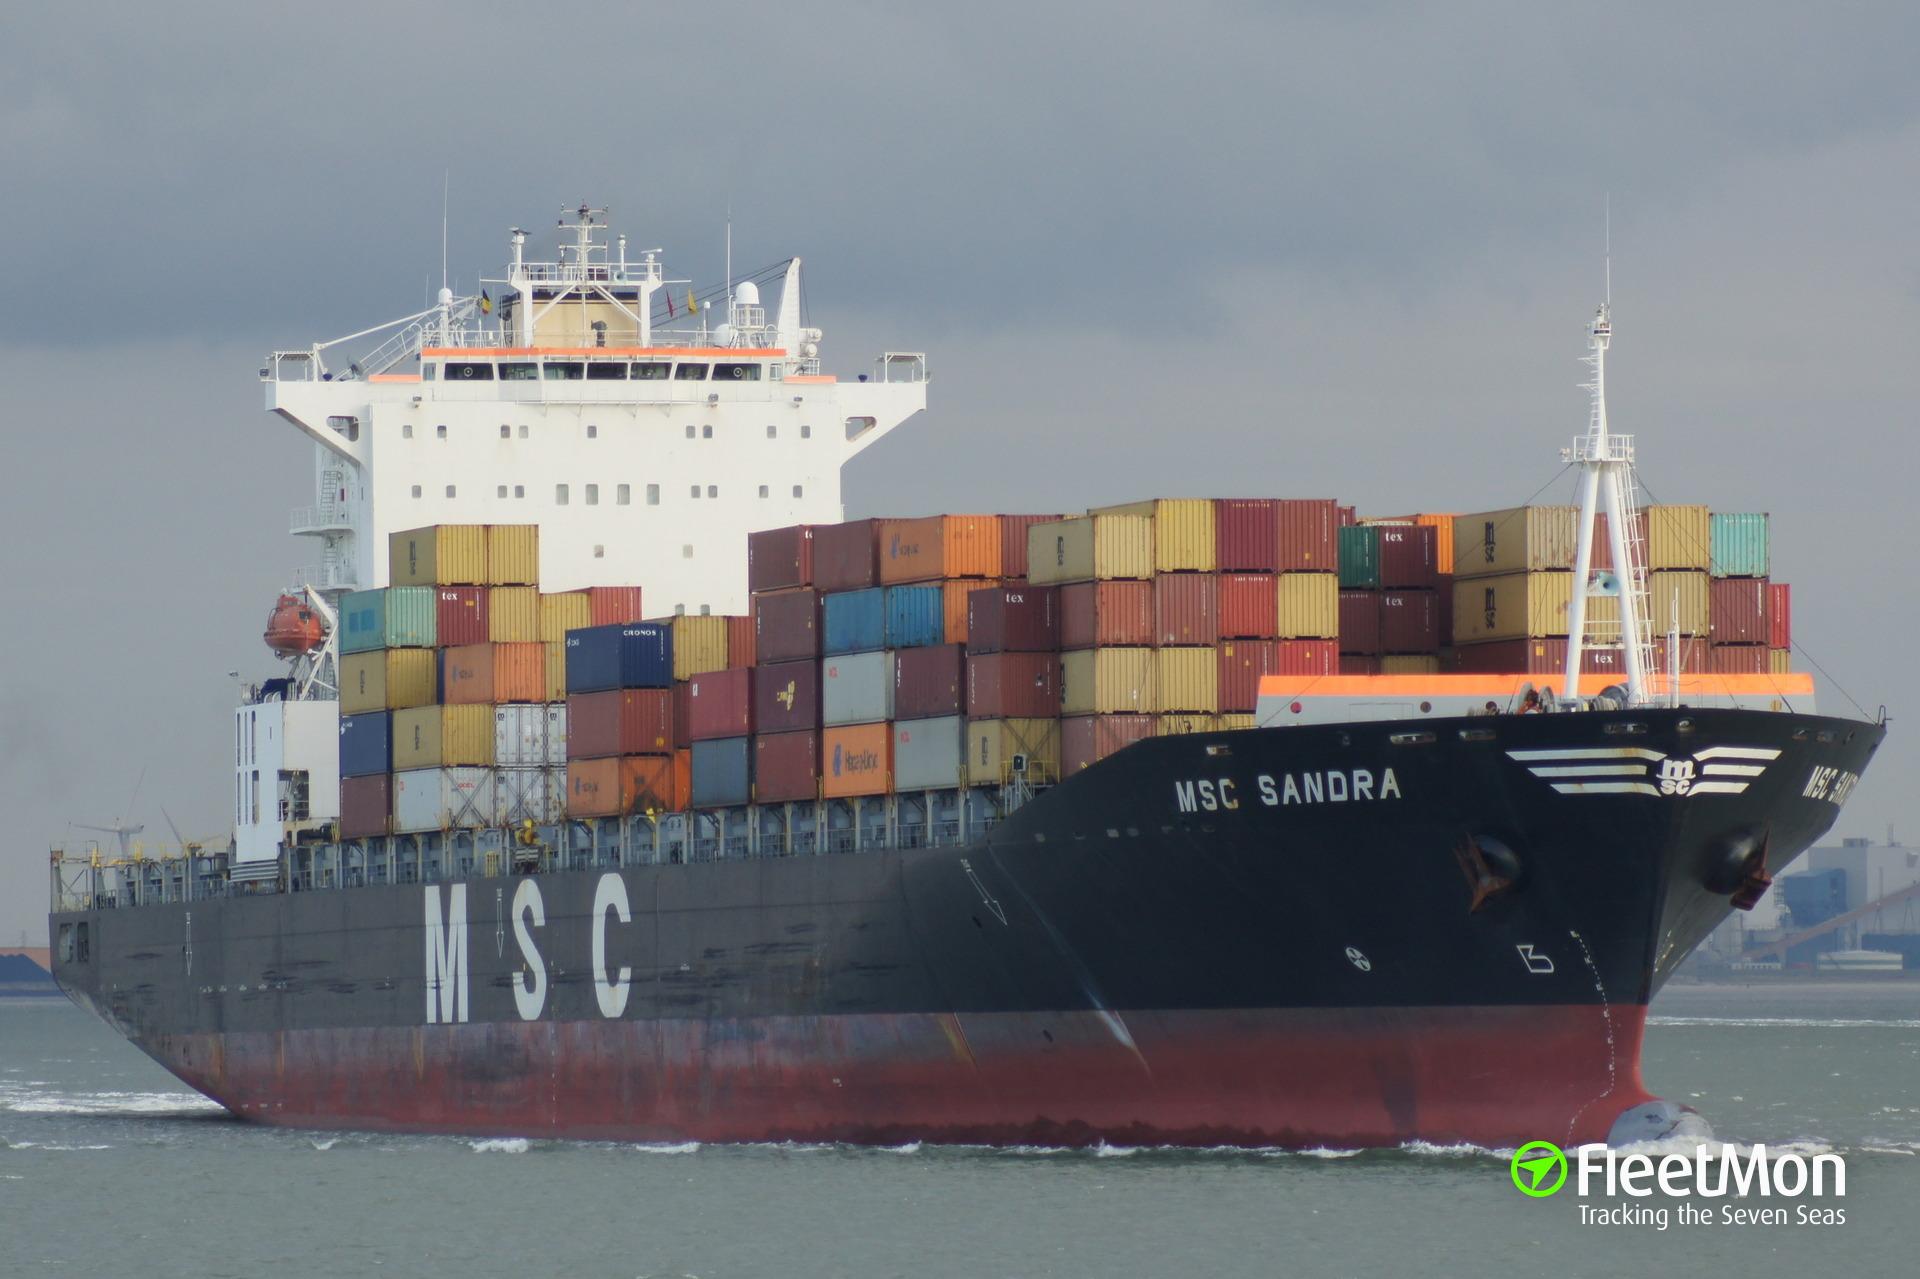 Container ship MSC SANDRA damaged in Bremerhaven